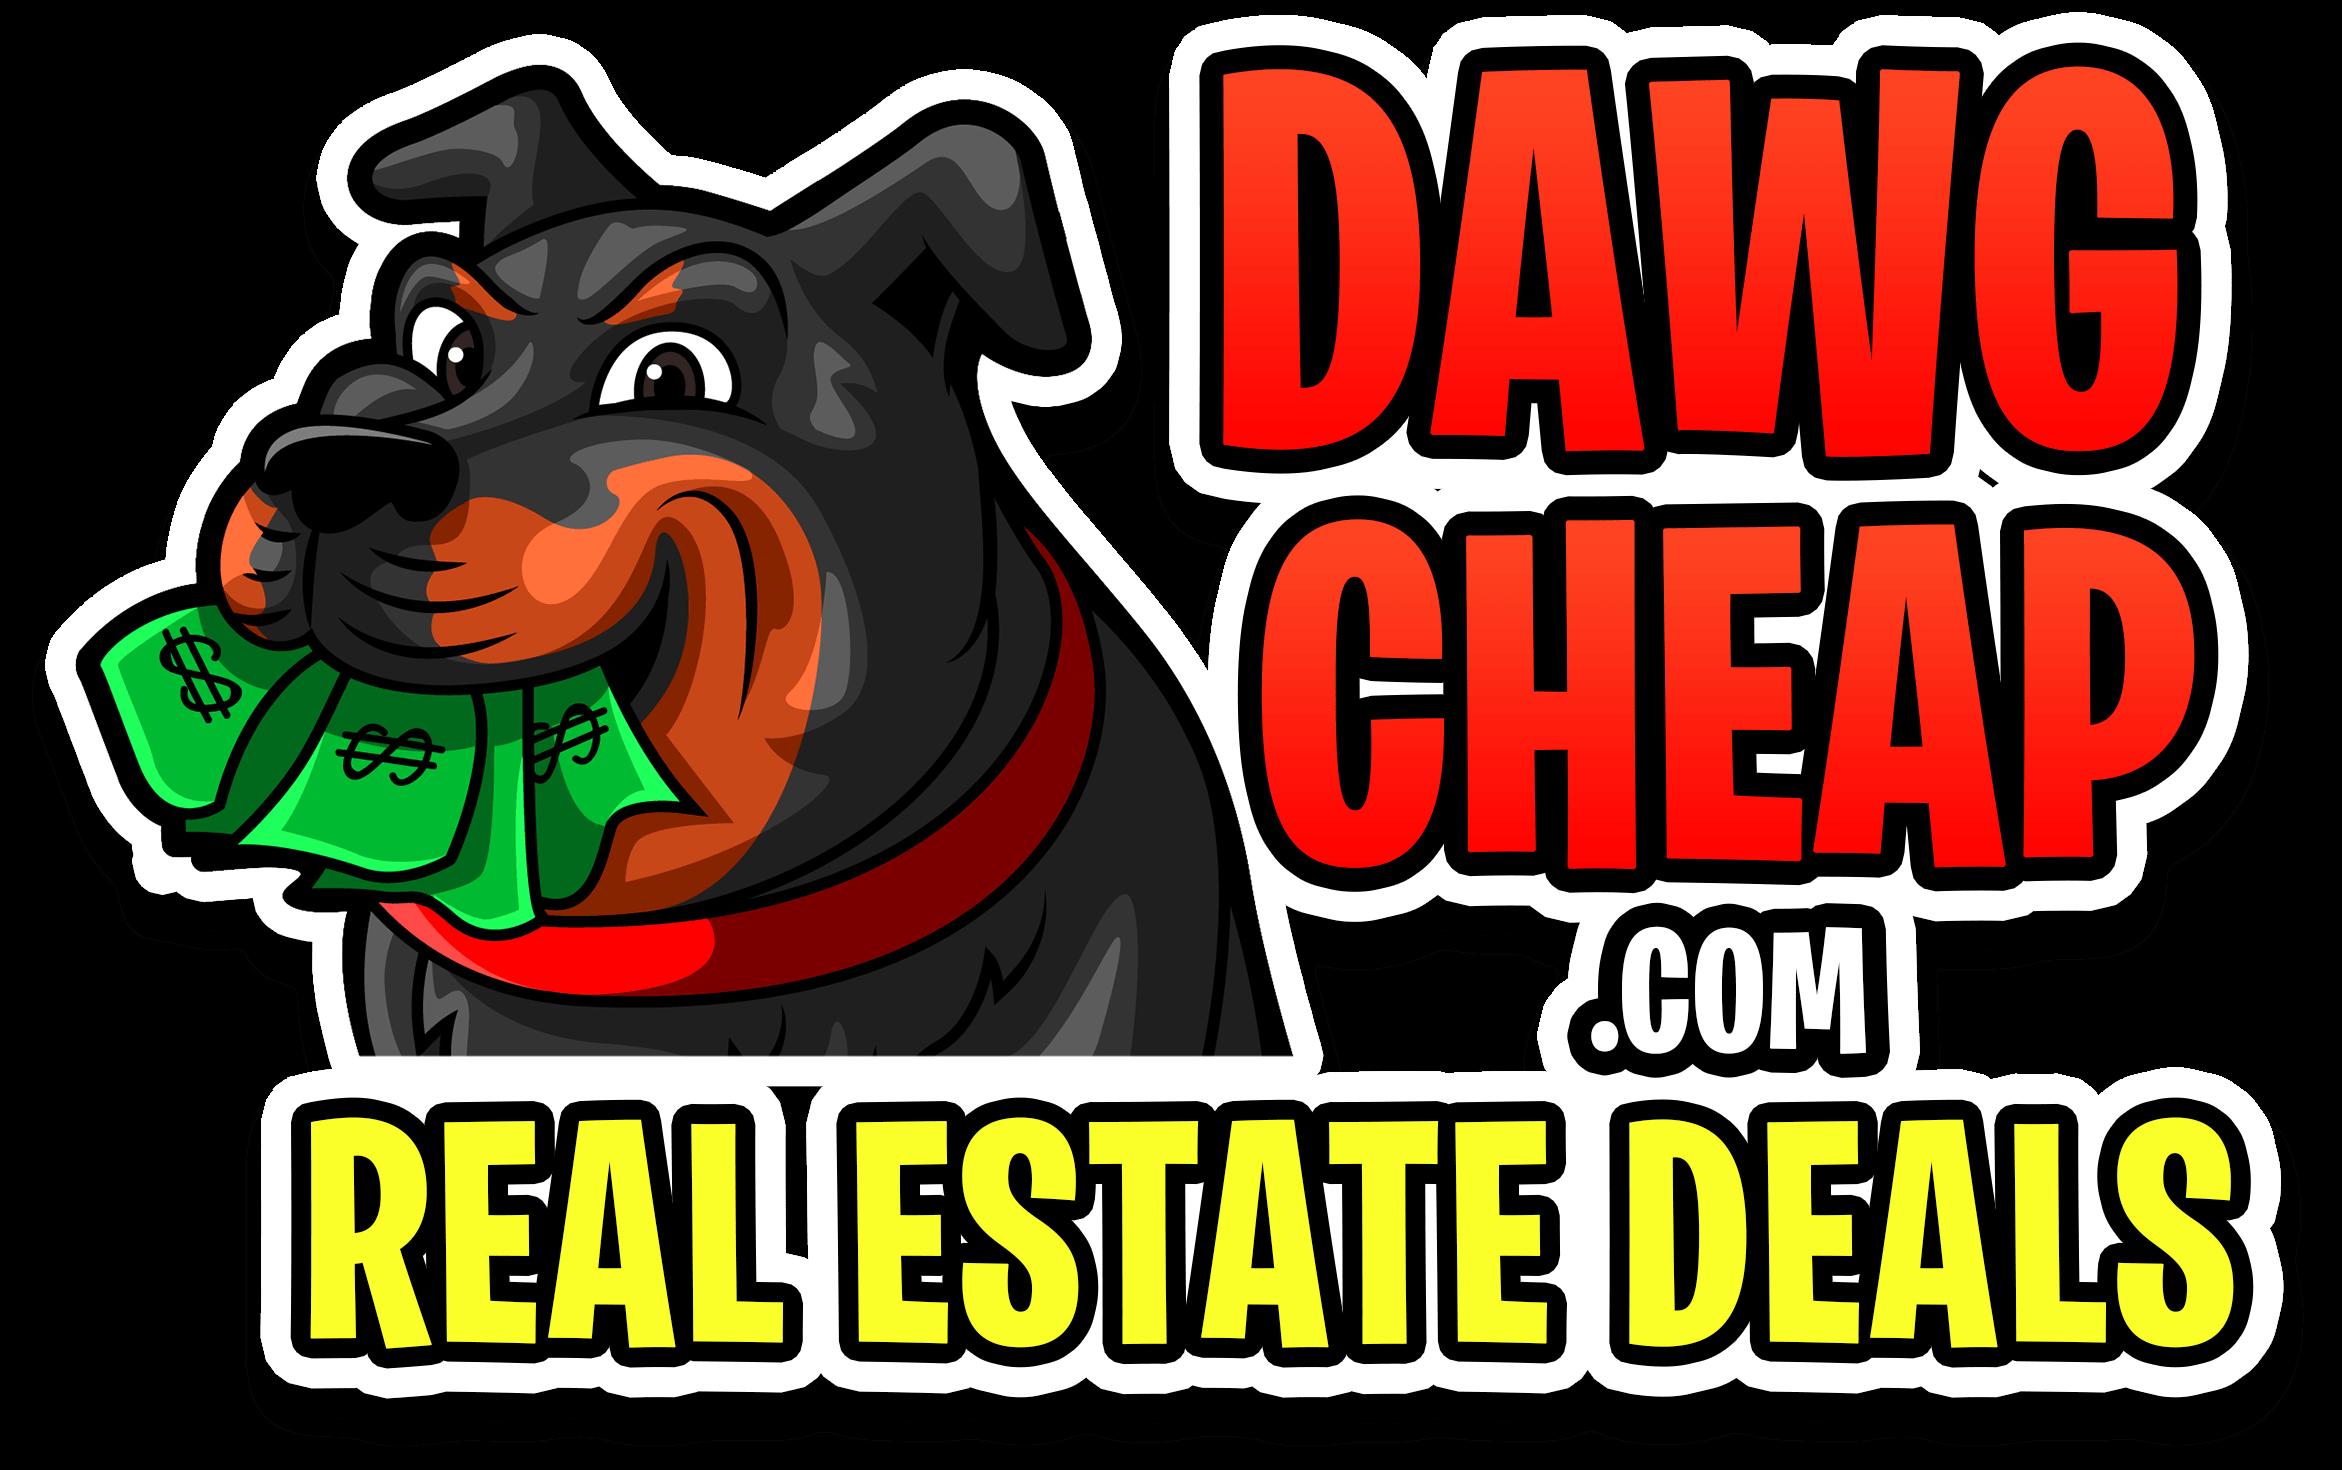 DawgCheap.com